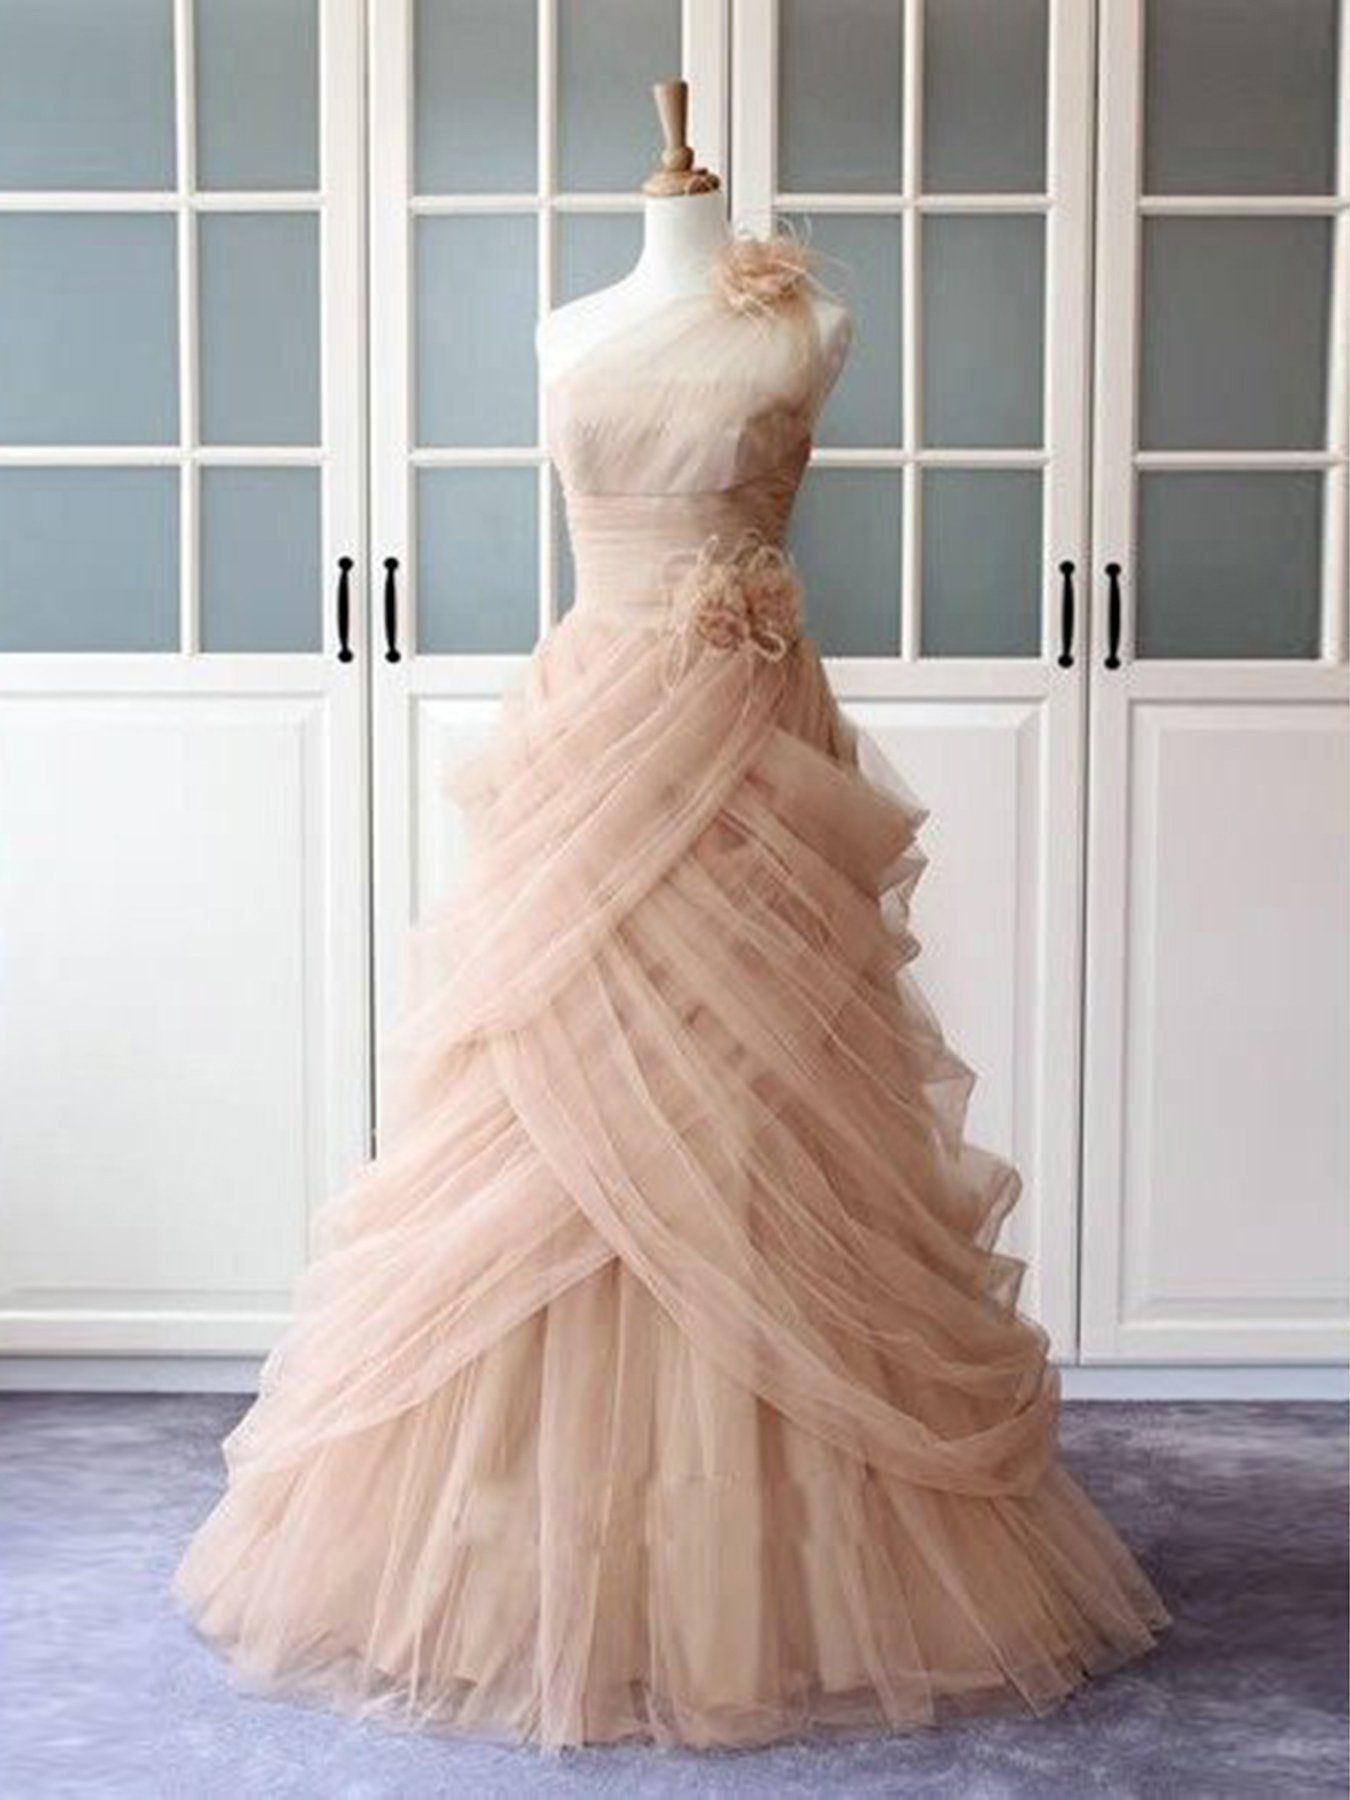 13 Perfekt Abend Dress Online Stylish Fantastisch Abend Dress Online Spezialgebiet